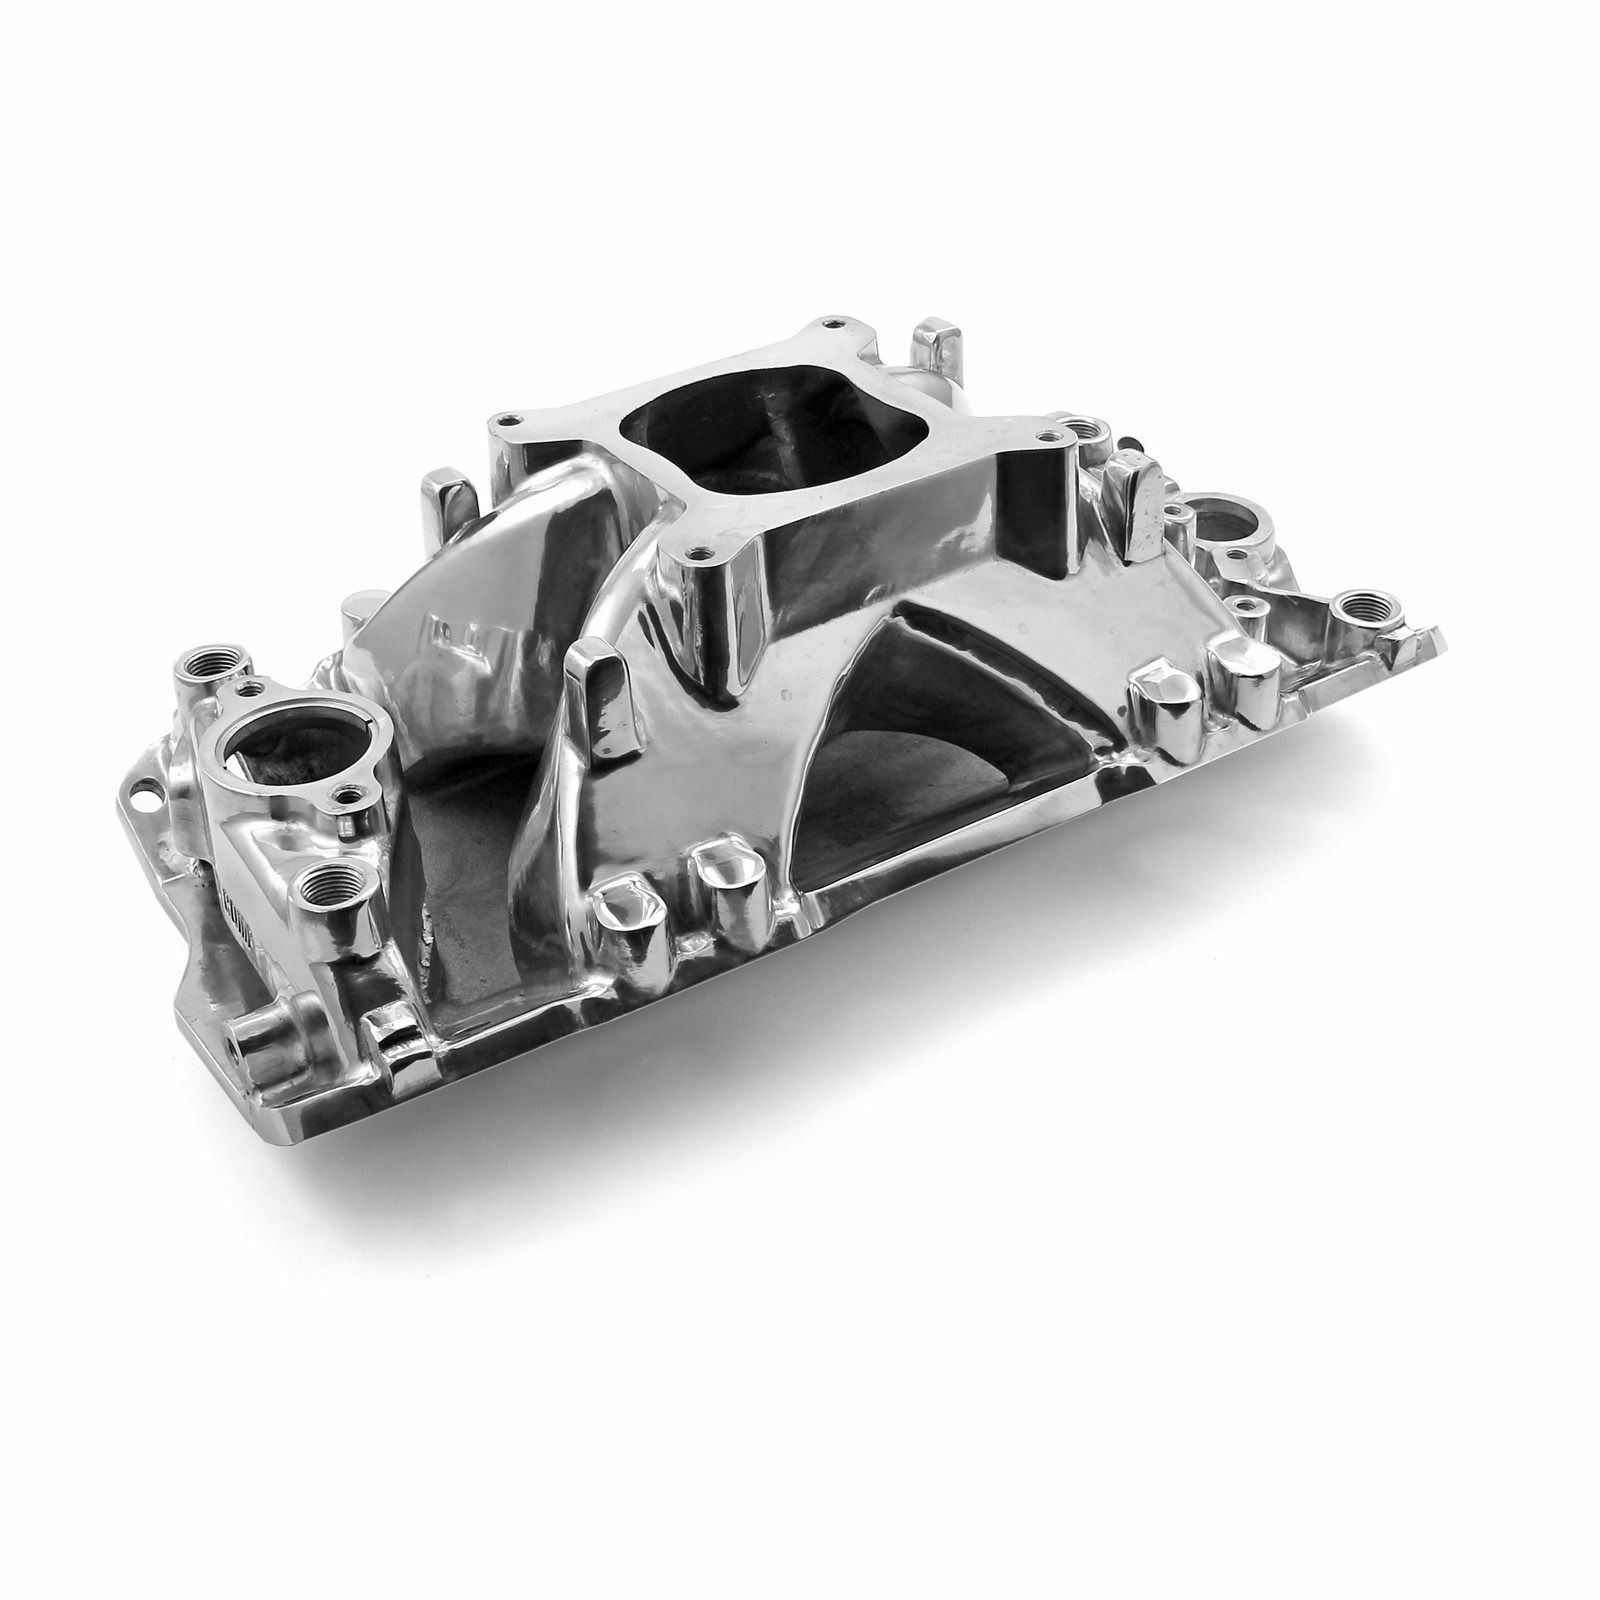 Sbc Polished Aluminum Intake 350 Shoot Out Series High